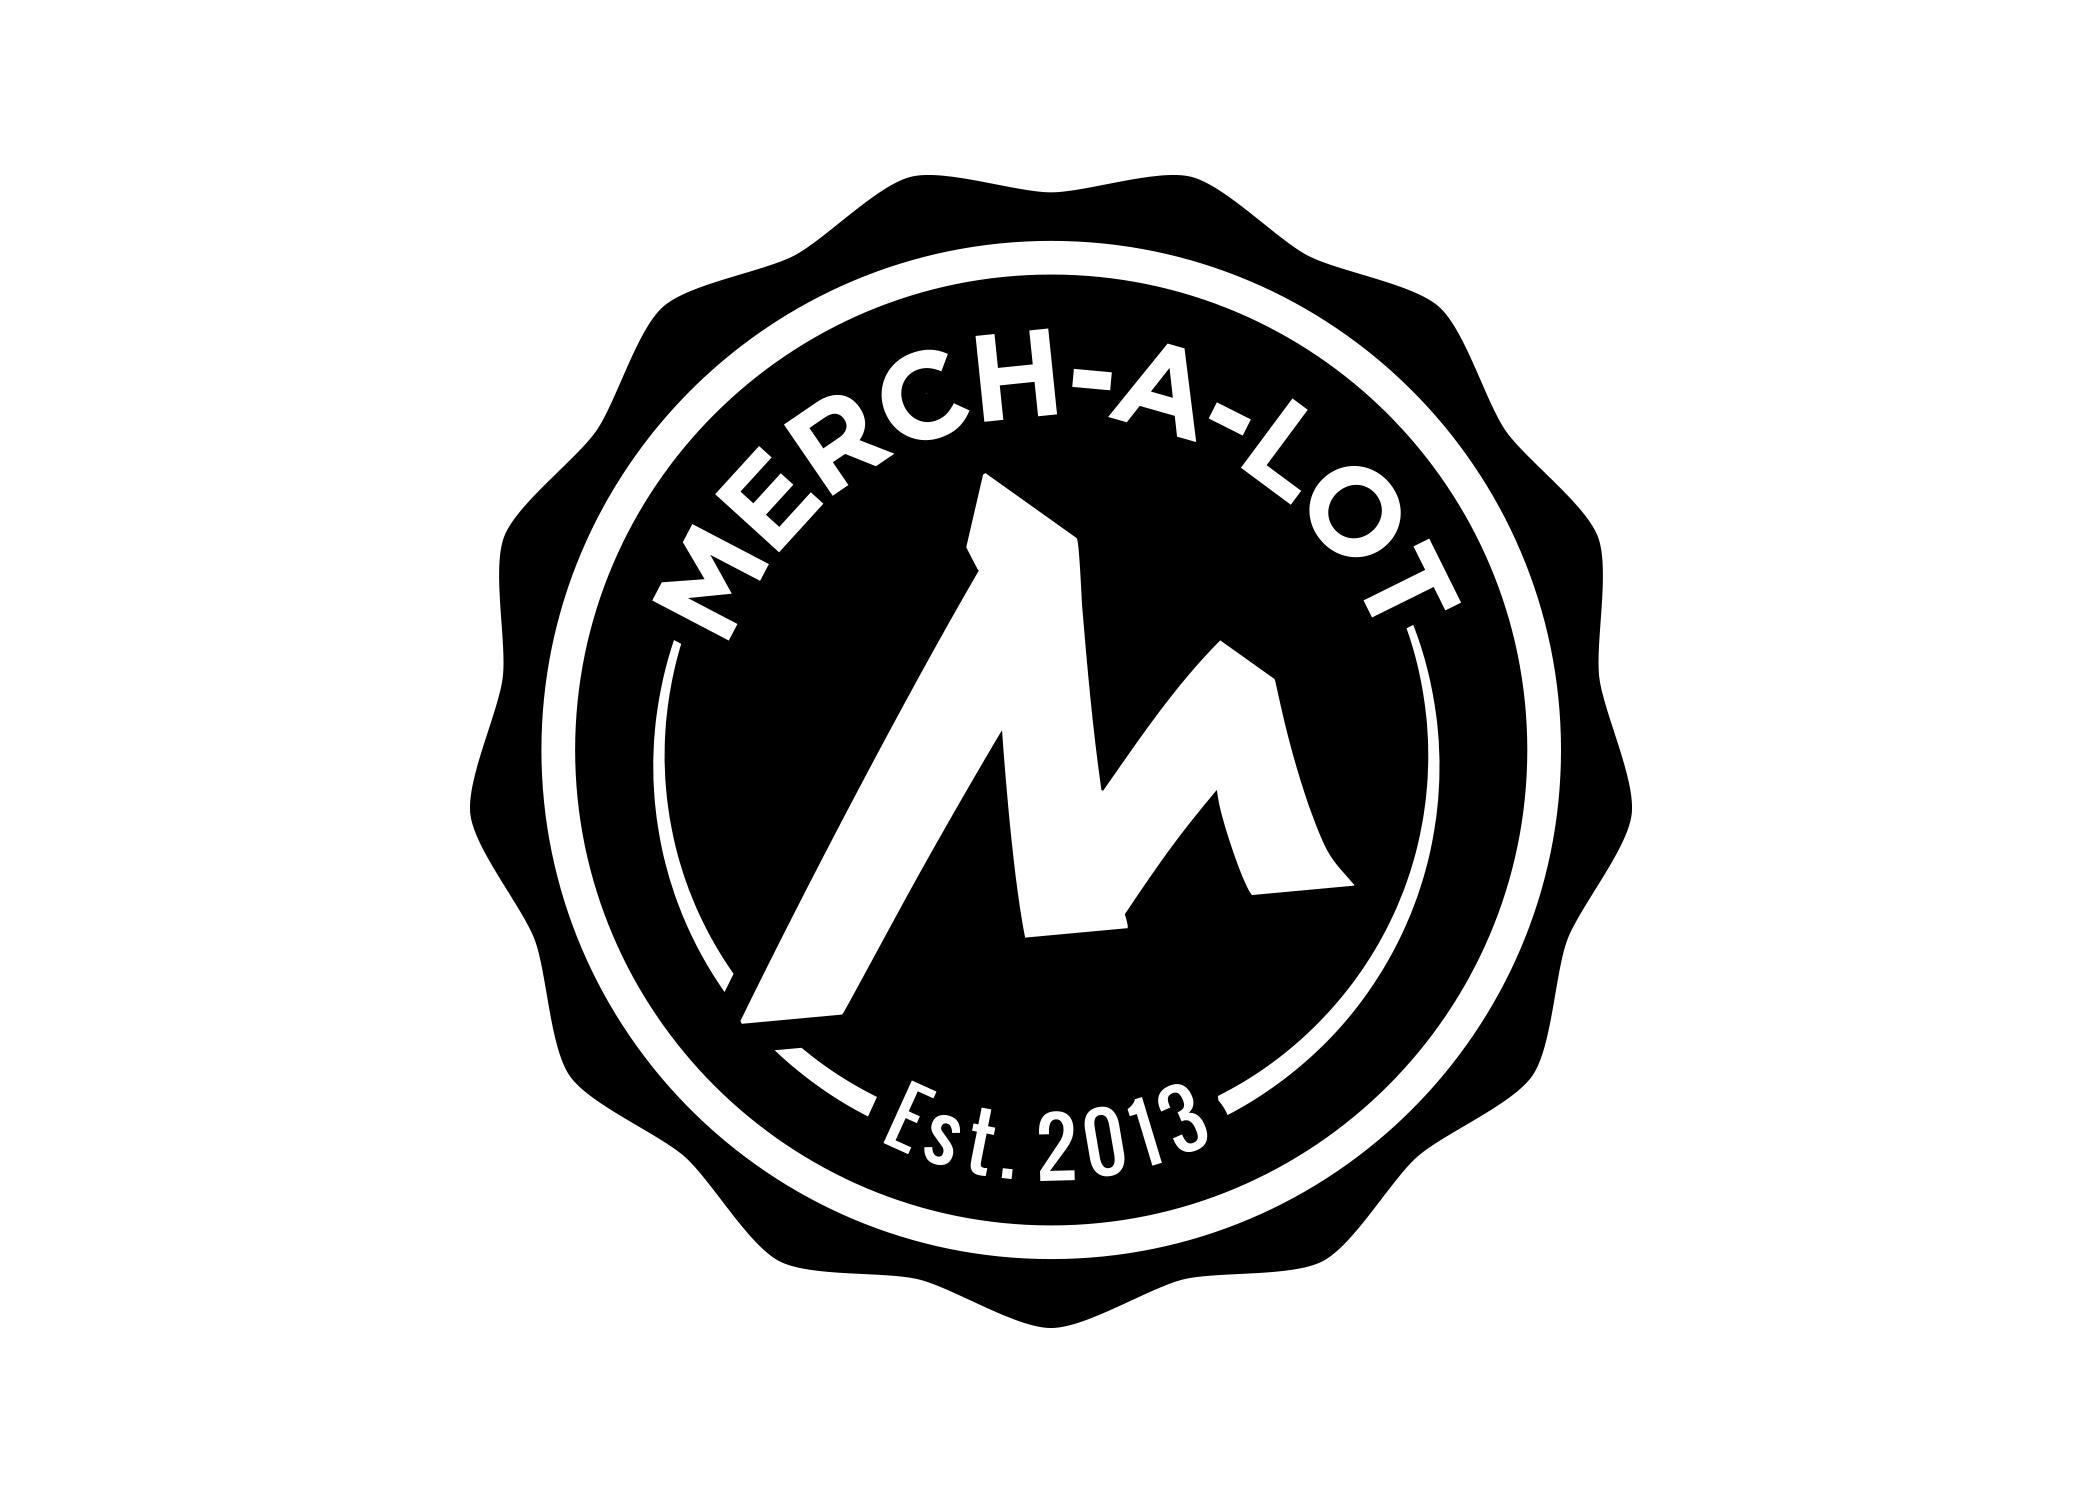 Copy of MerchALot Logo.jpg